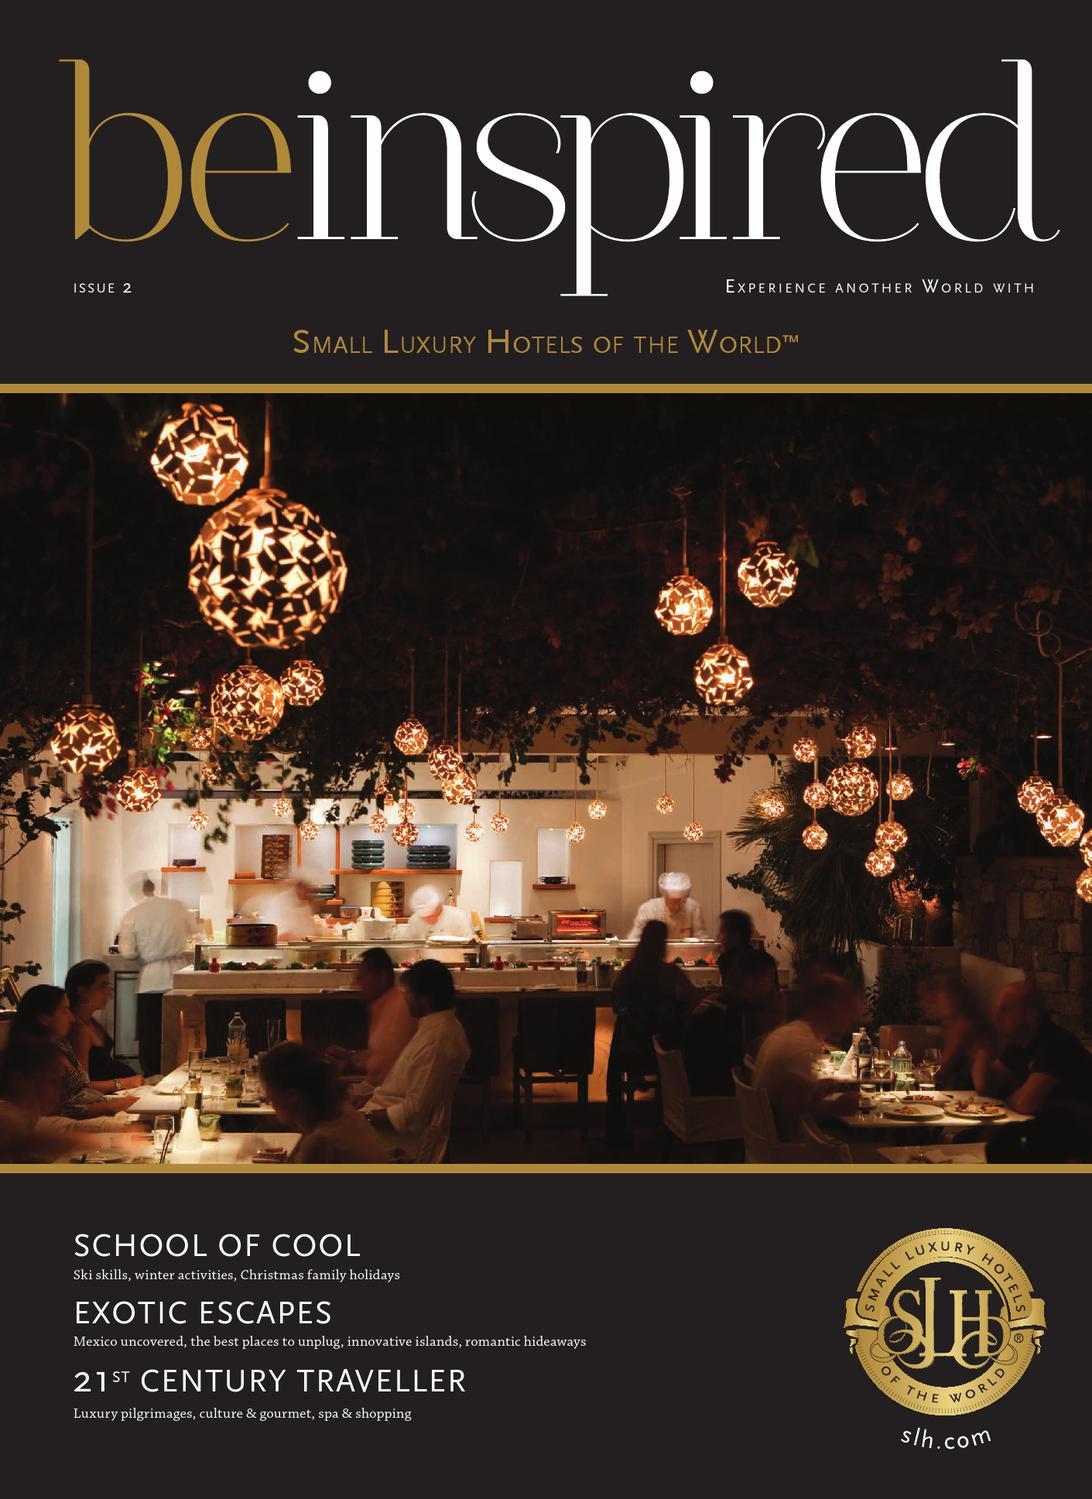 Amadeus Nightclub Aberdeen slh be inspired magazine issue 2strattons - issuu